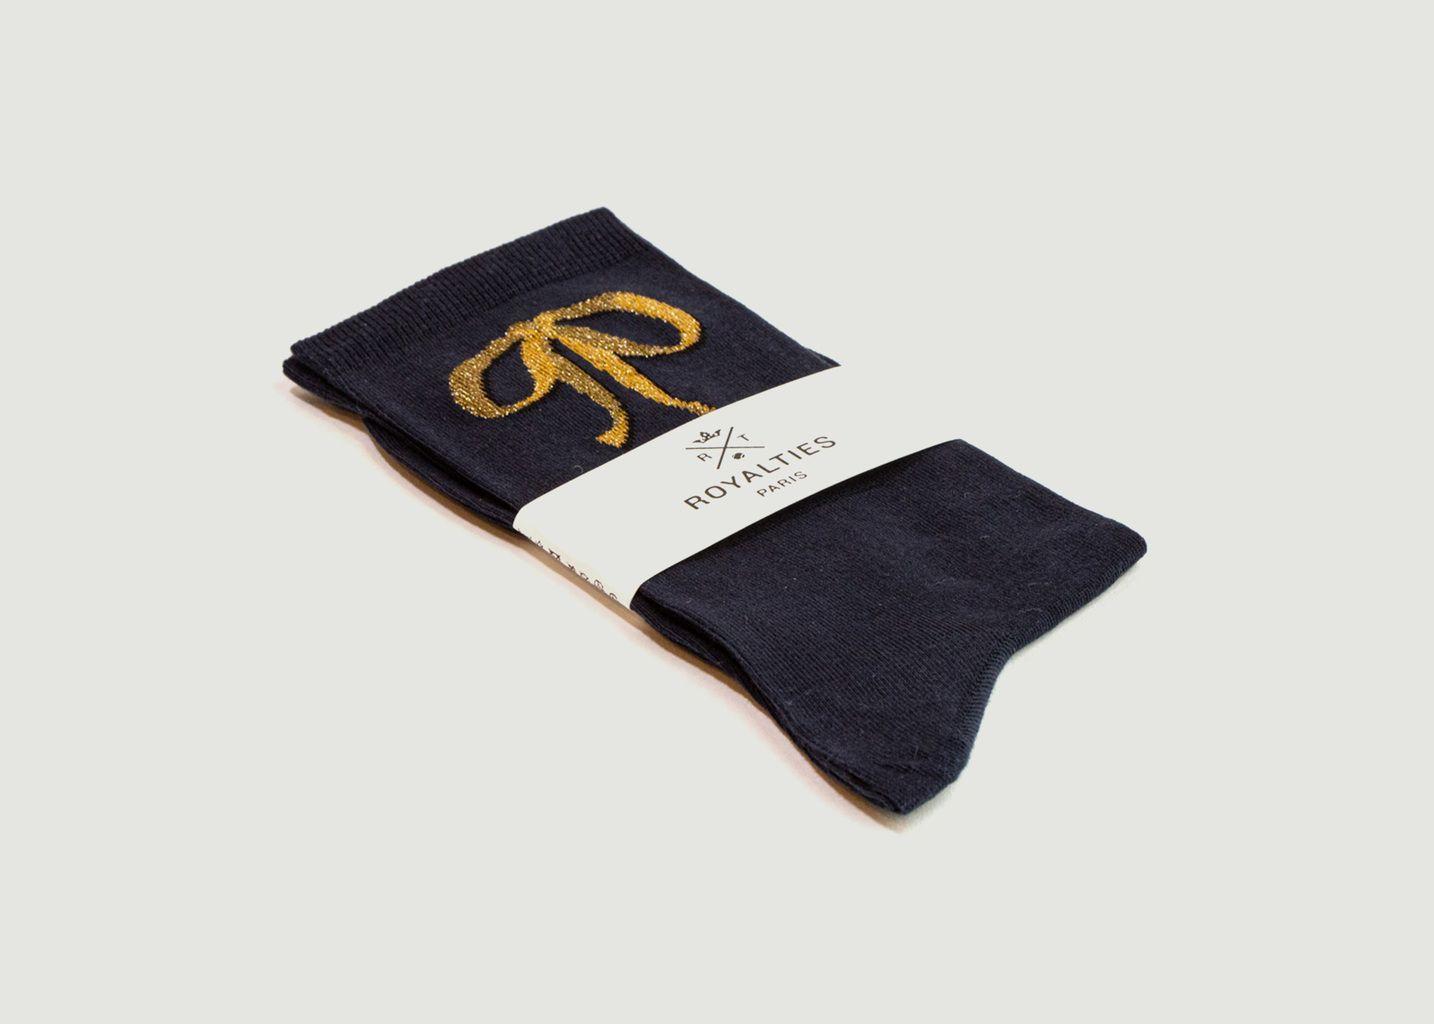 Chaussettes motif nœud Milady - Royalties